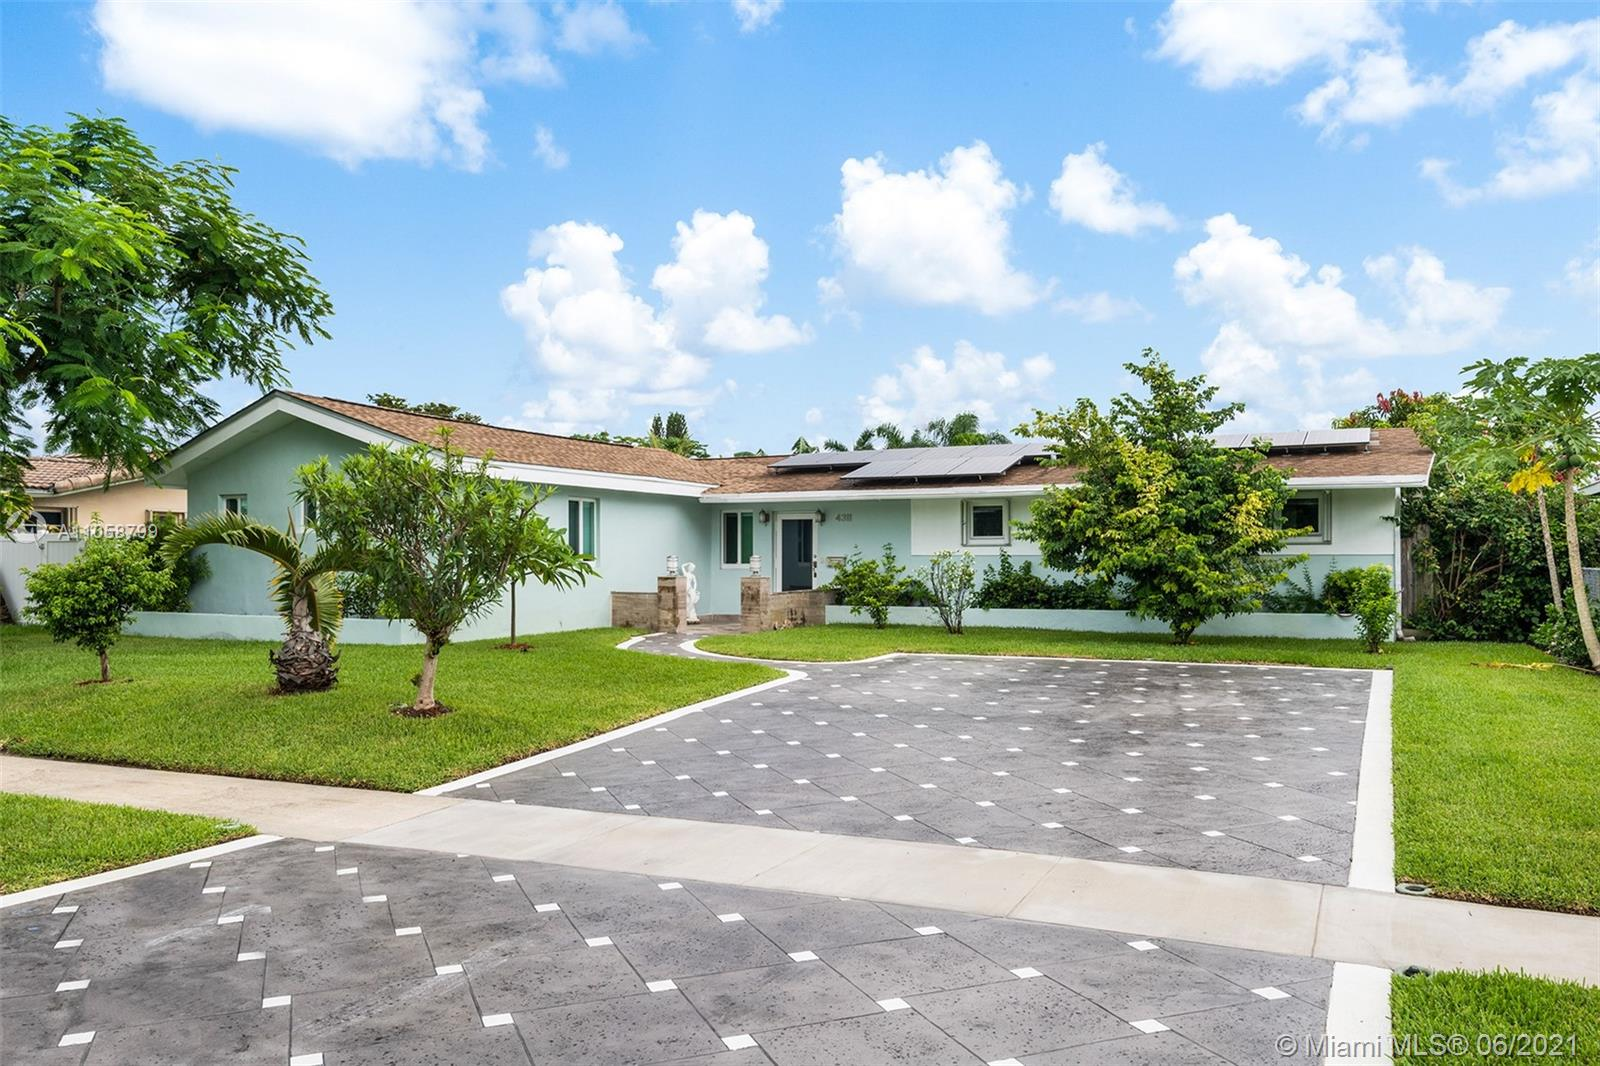 Hollywood Hills - 4311 Hayes St, Hollywood, FL 33021